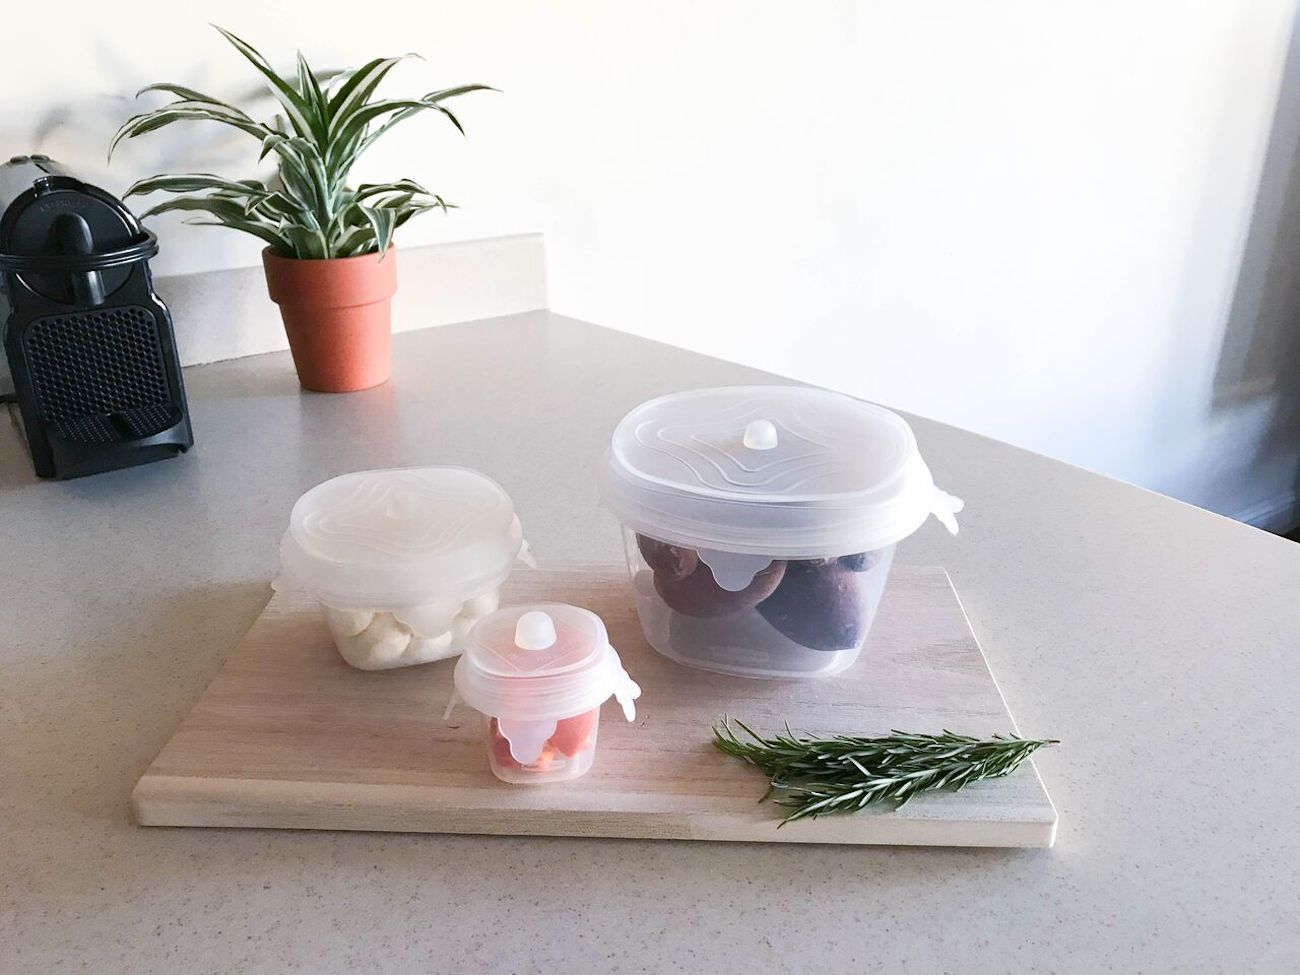 UniLid Universal Kitchen Lid Set